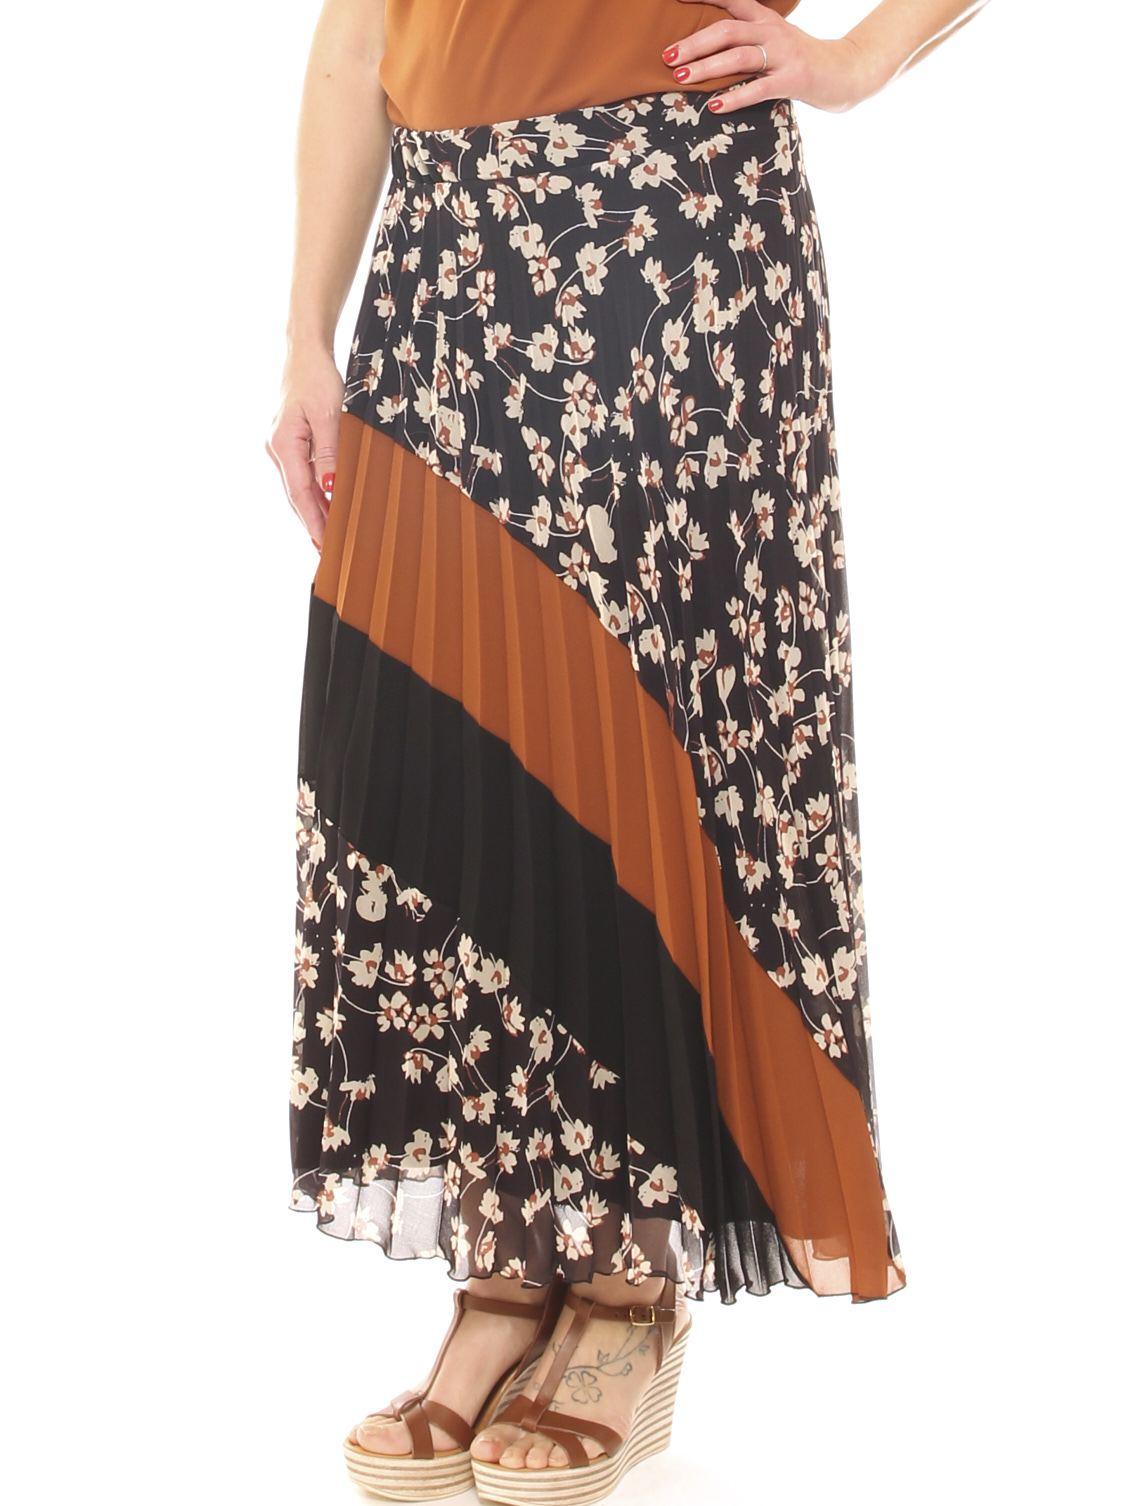 Falda larga para mujer georgette, plisada, de lujo, suave